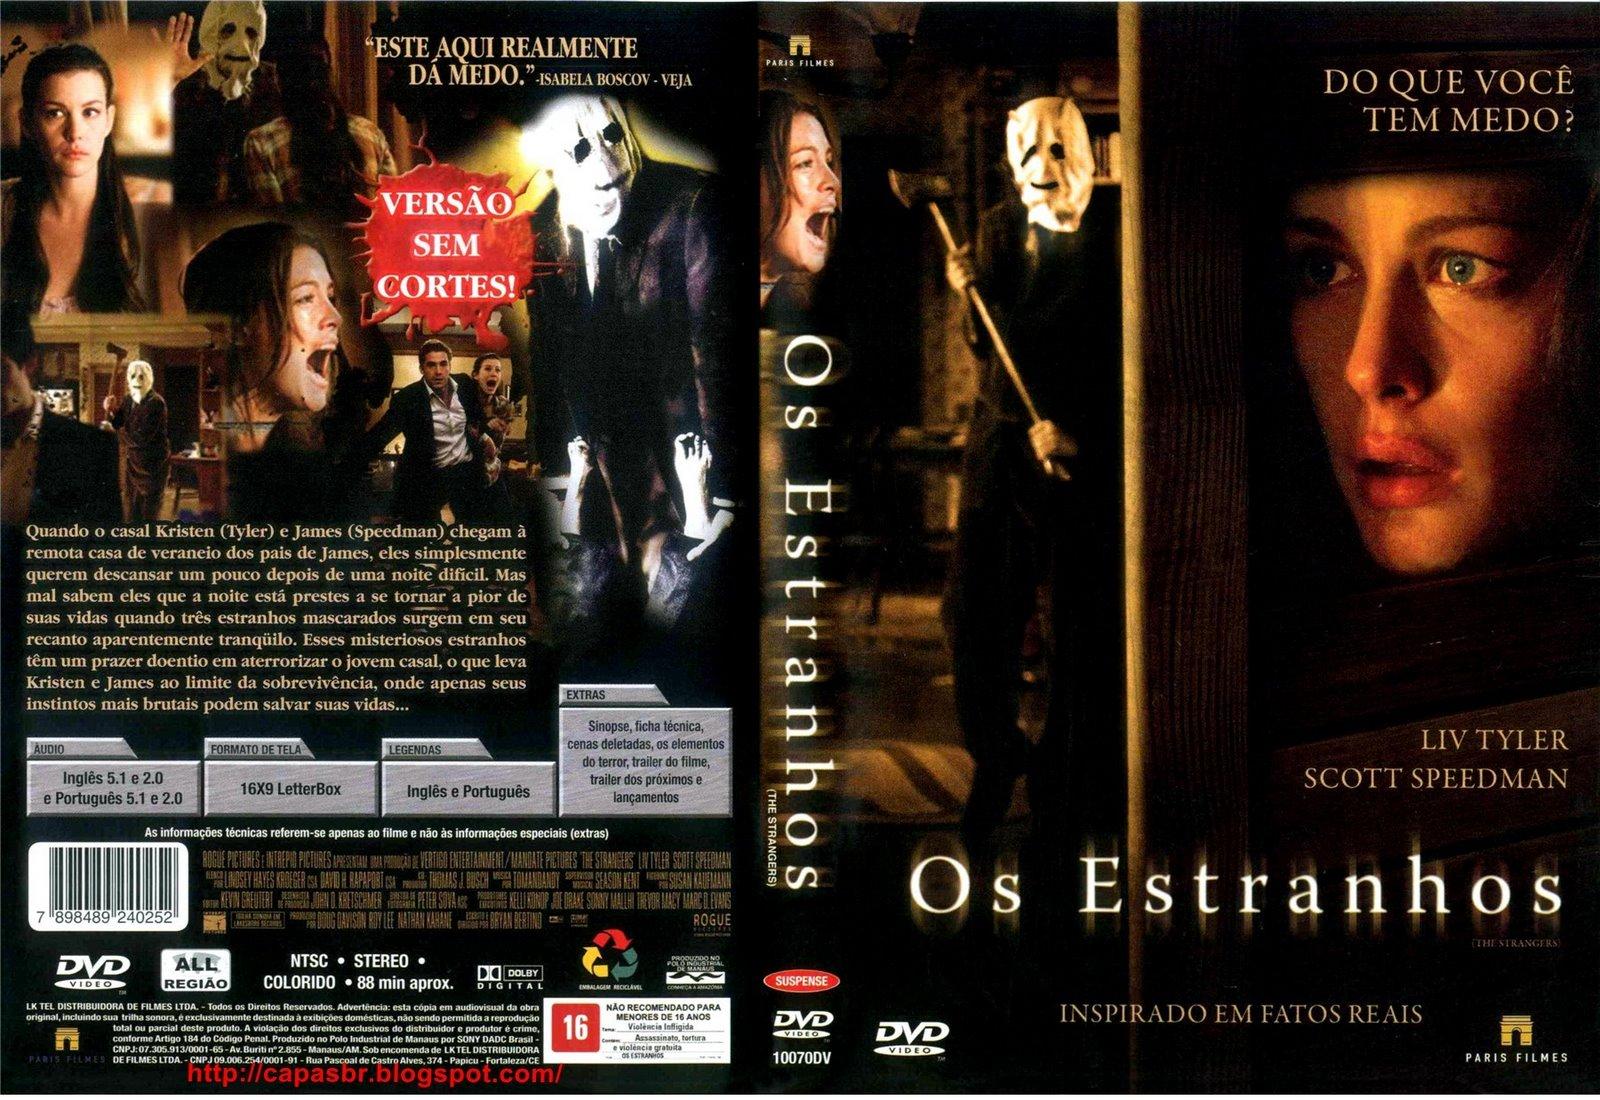 http://4.bp.blogspot.com/-7hyJpWa2xhY/ThD_gatYgJI/AAAAAAAACJk/cRRrHo8th-Q/s1600/os_estranhos_panico1.jpg